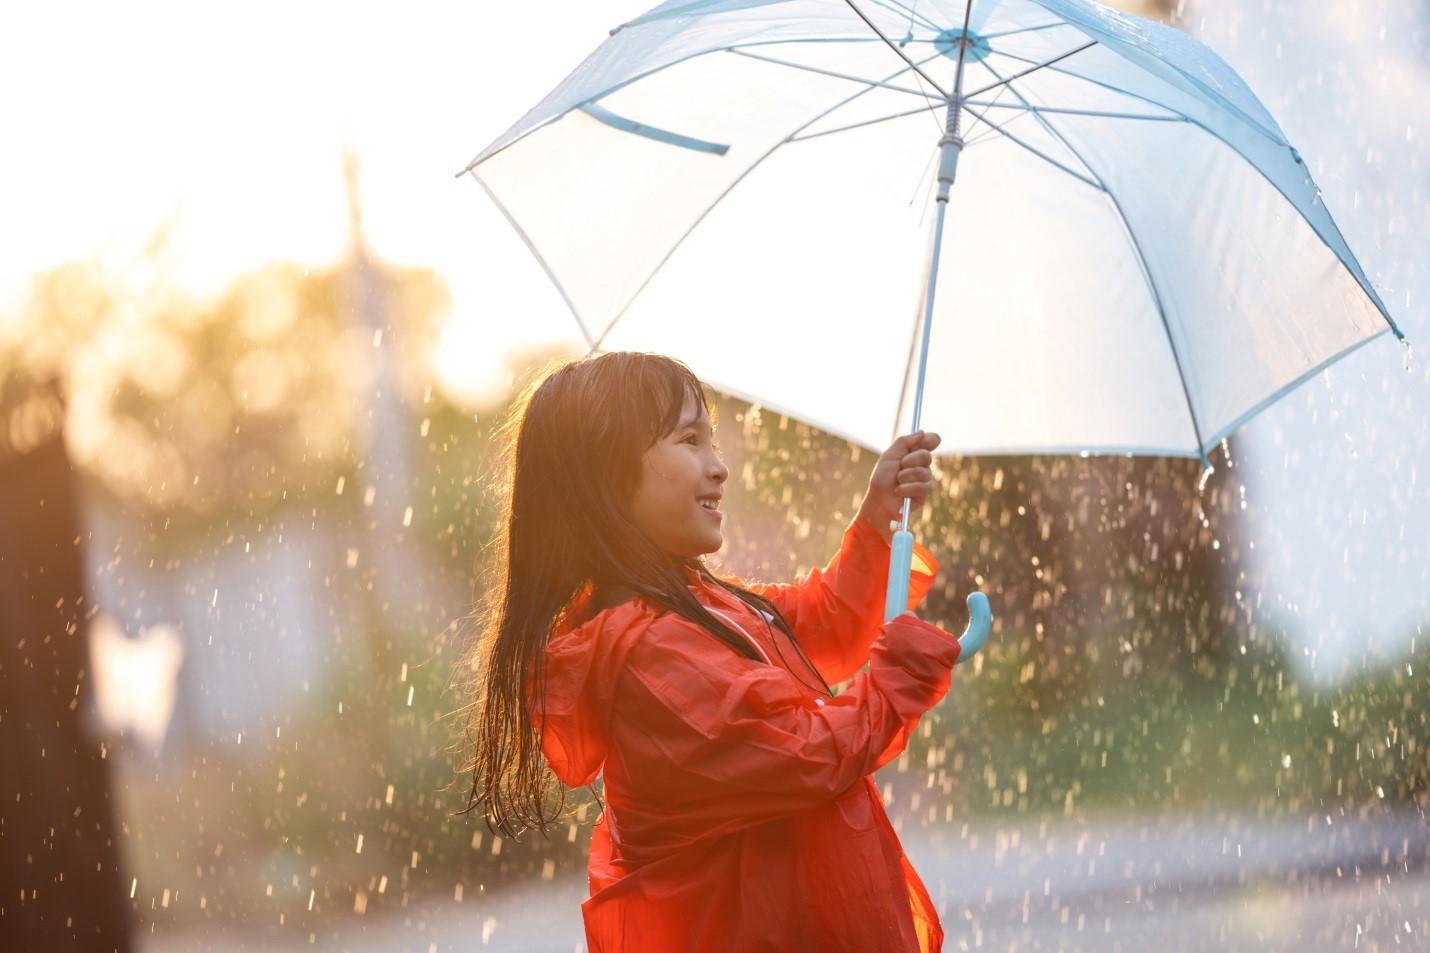 8 Tips Menghindari Flu, Batuk, dan Pilek Saat Musim Hujan Datang